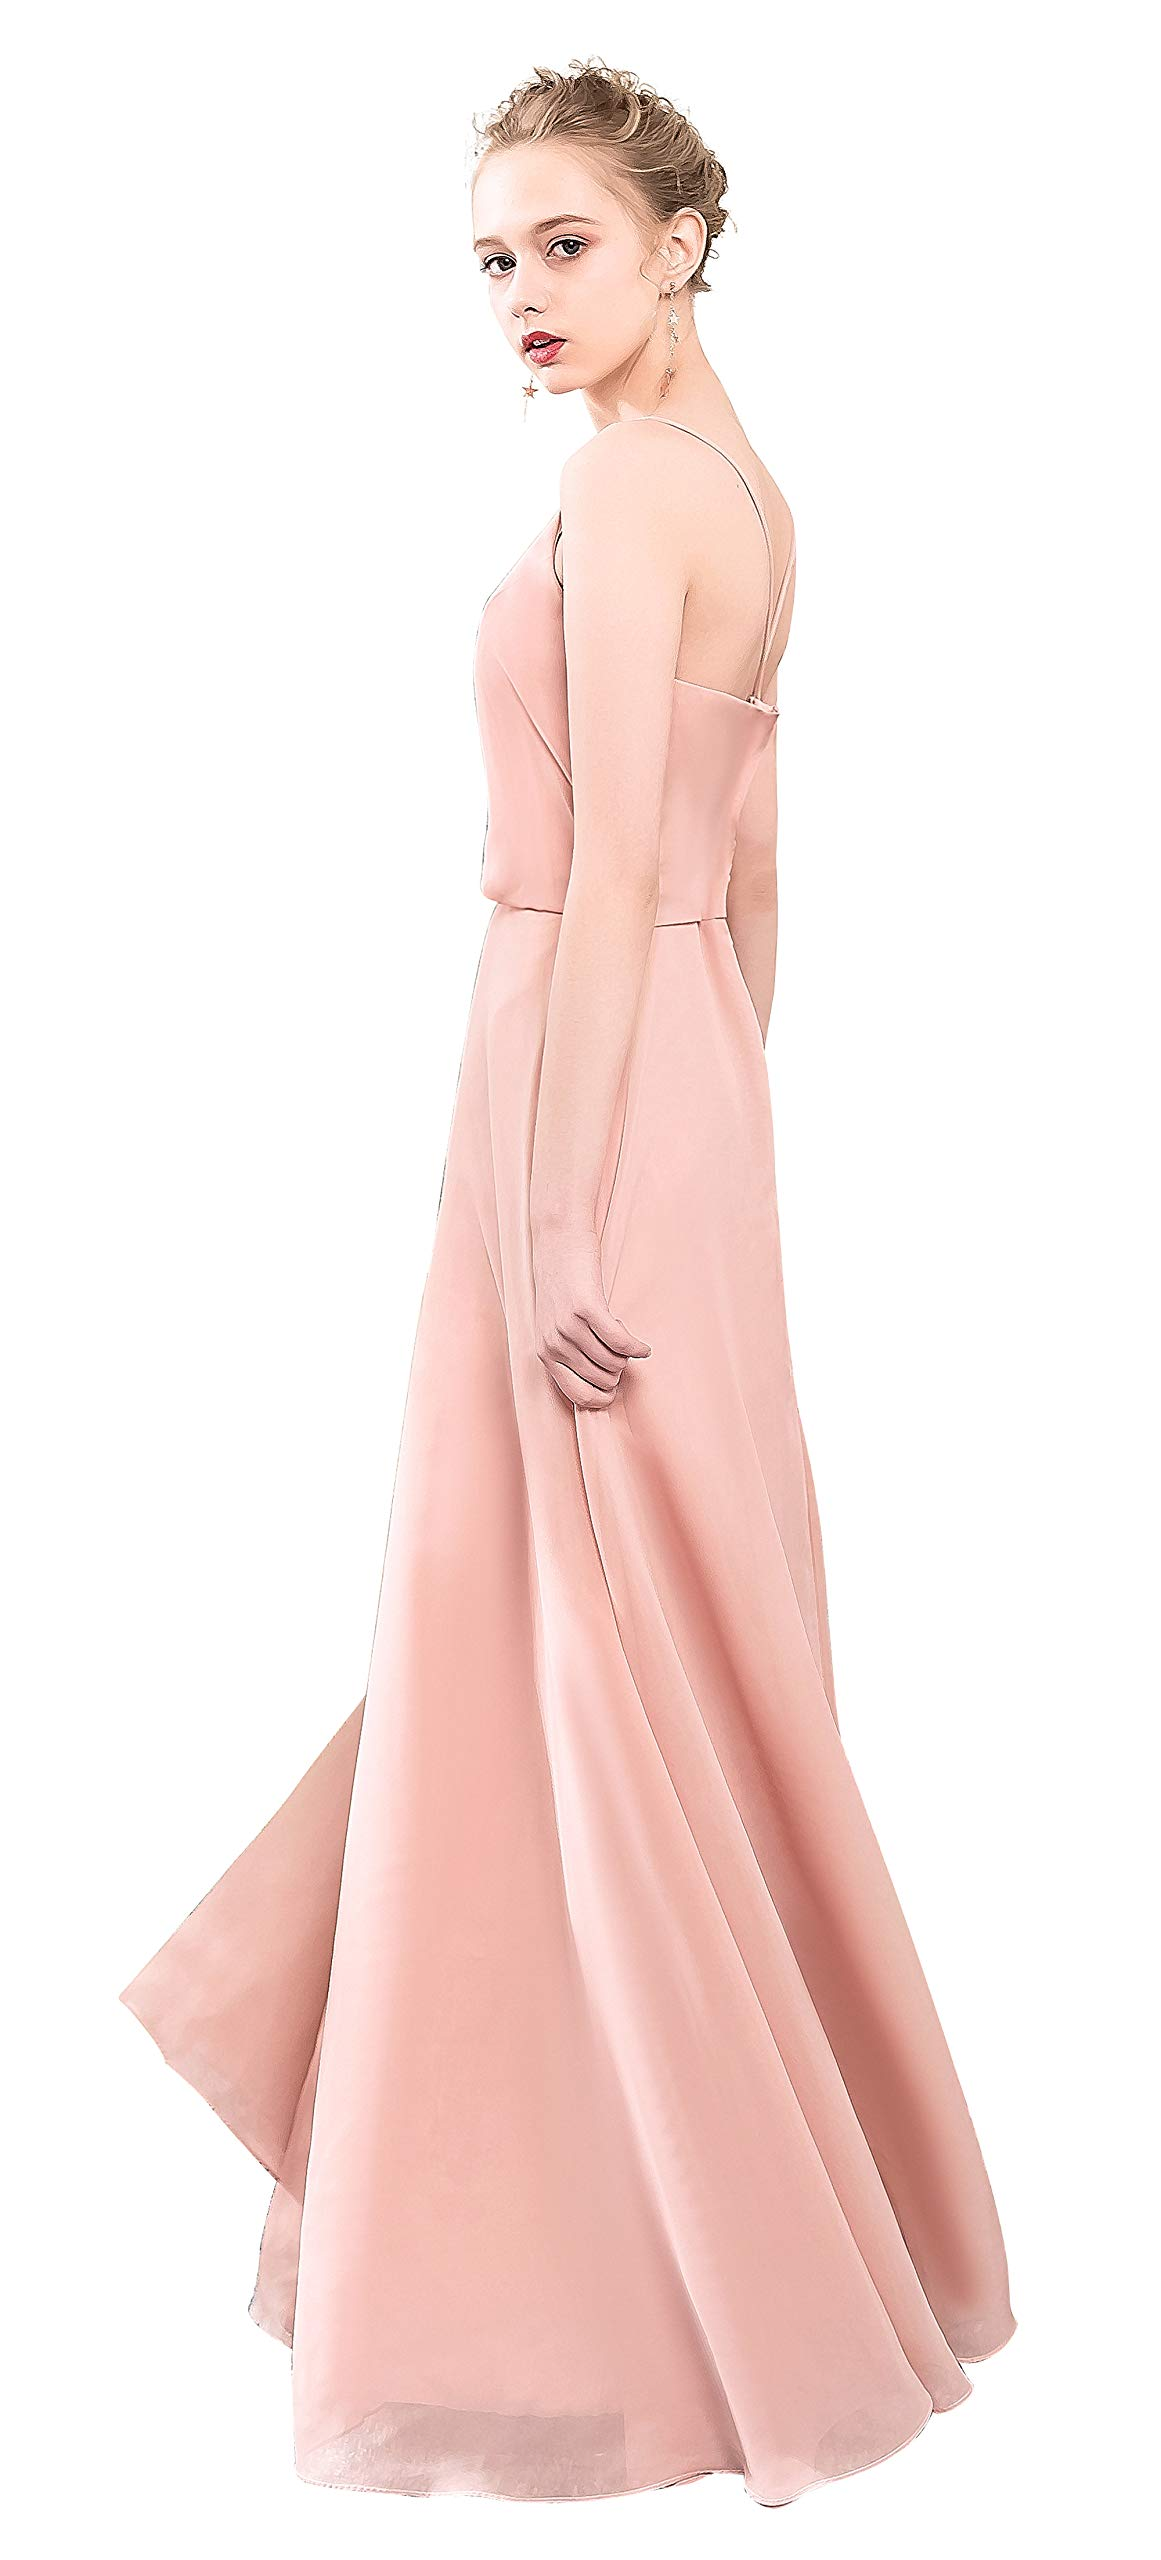 d08c0ac66dbb3 Lily Anny Chiffon Spaghetti Straps V Neck Flowing Bridesmaid Dress Prom  Gown L097LF Navy Blue US4